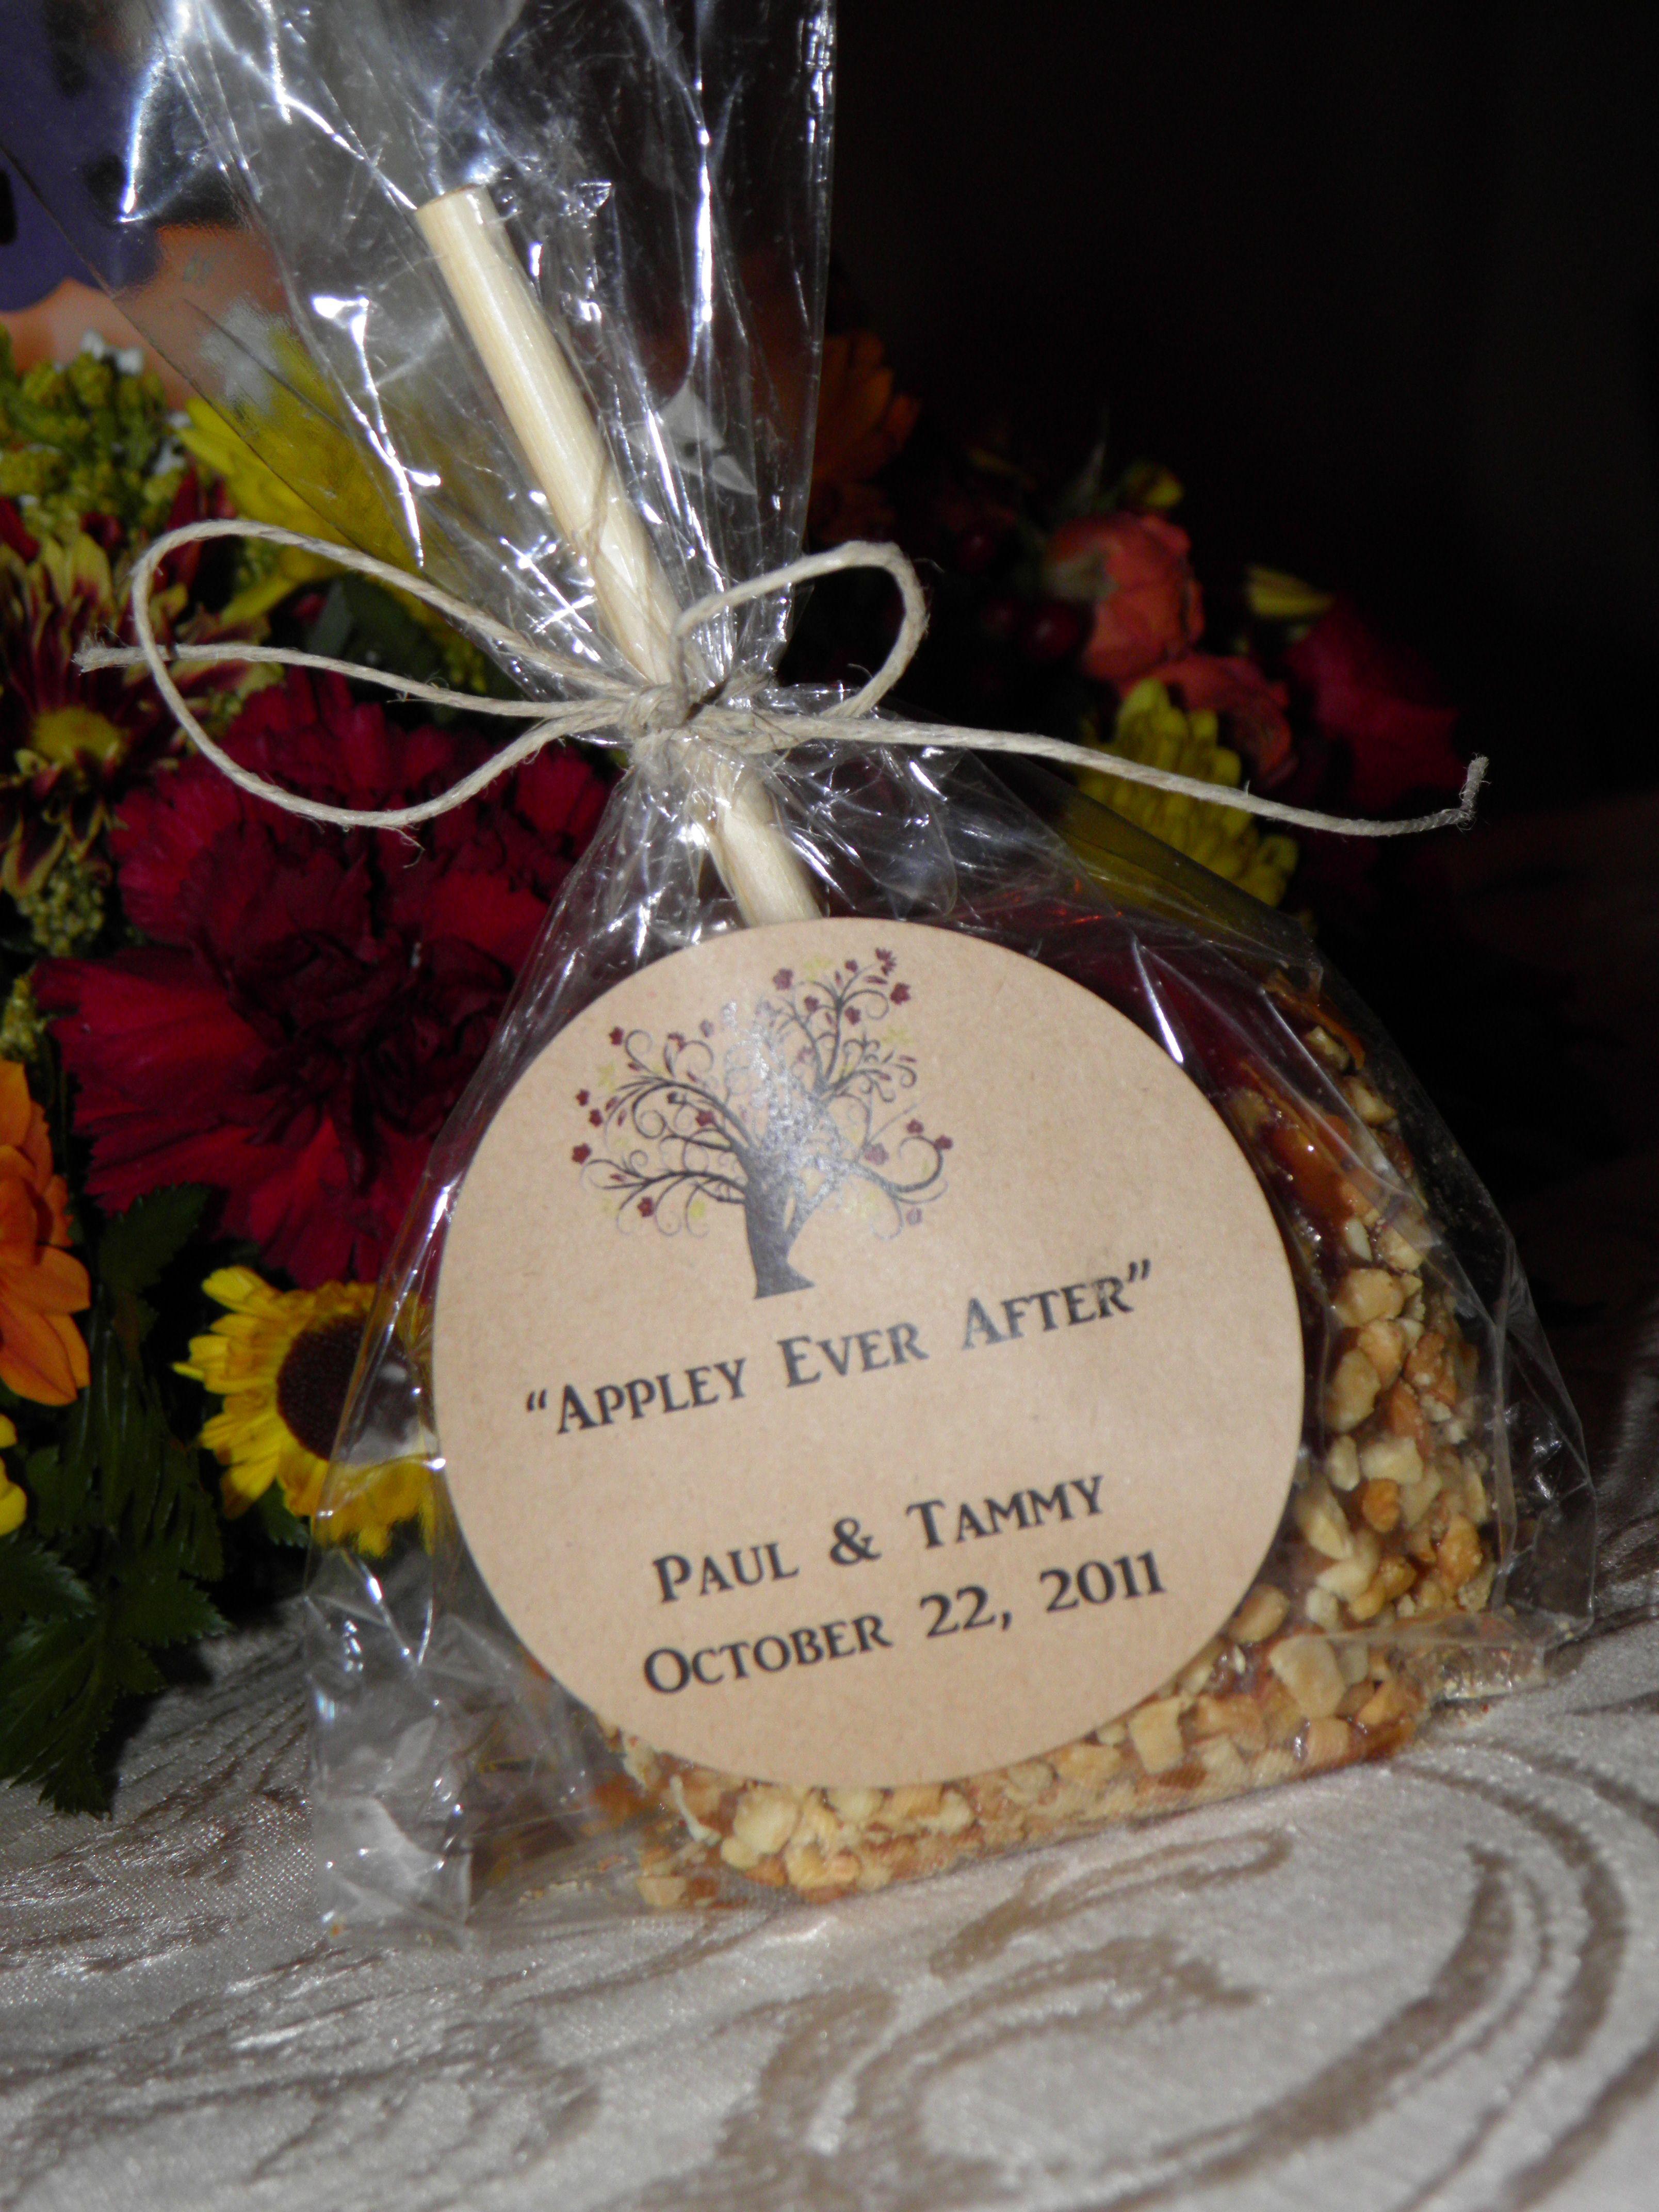 fall wedding favors Appley Ever After caramel apple wedding favors for a fall wedding Avery brown